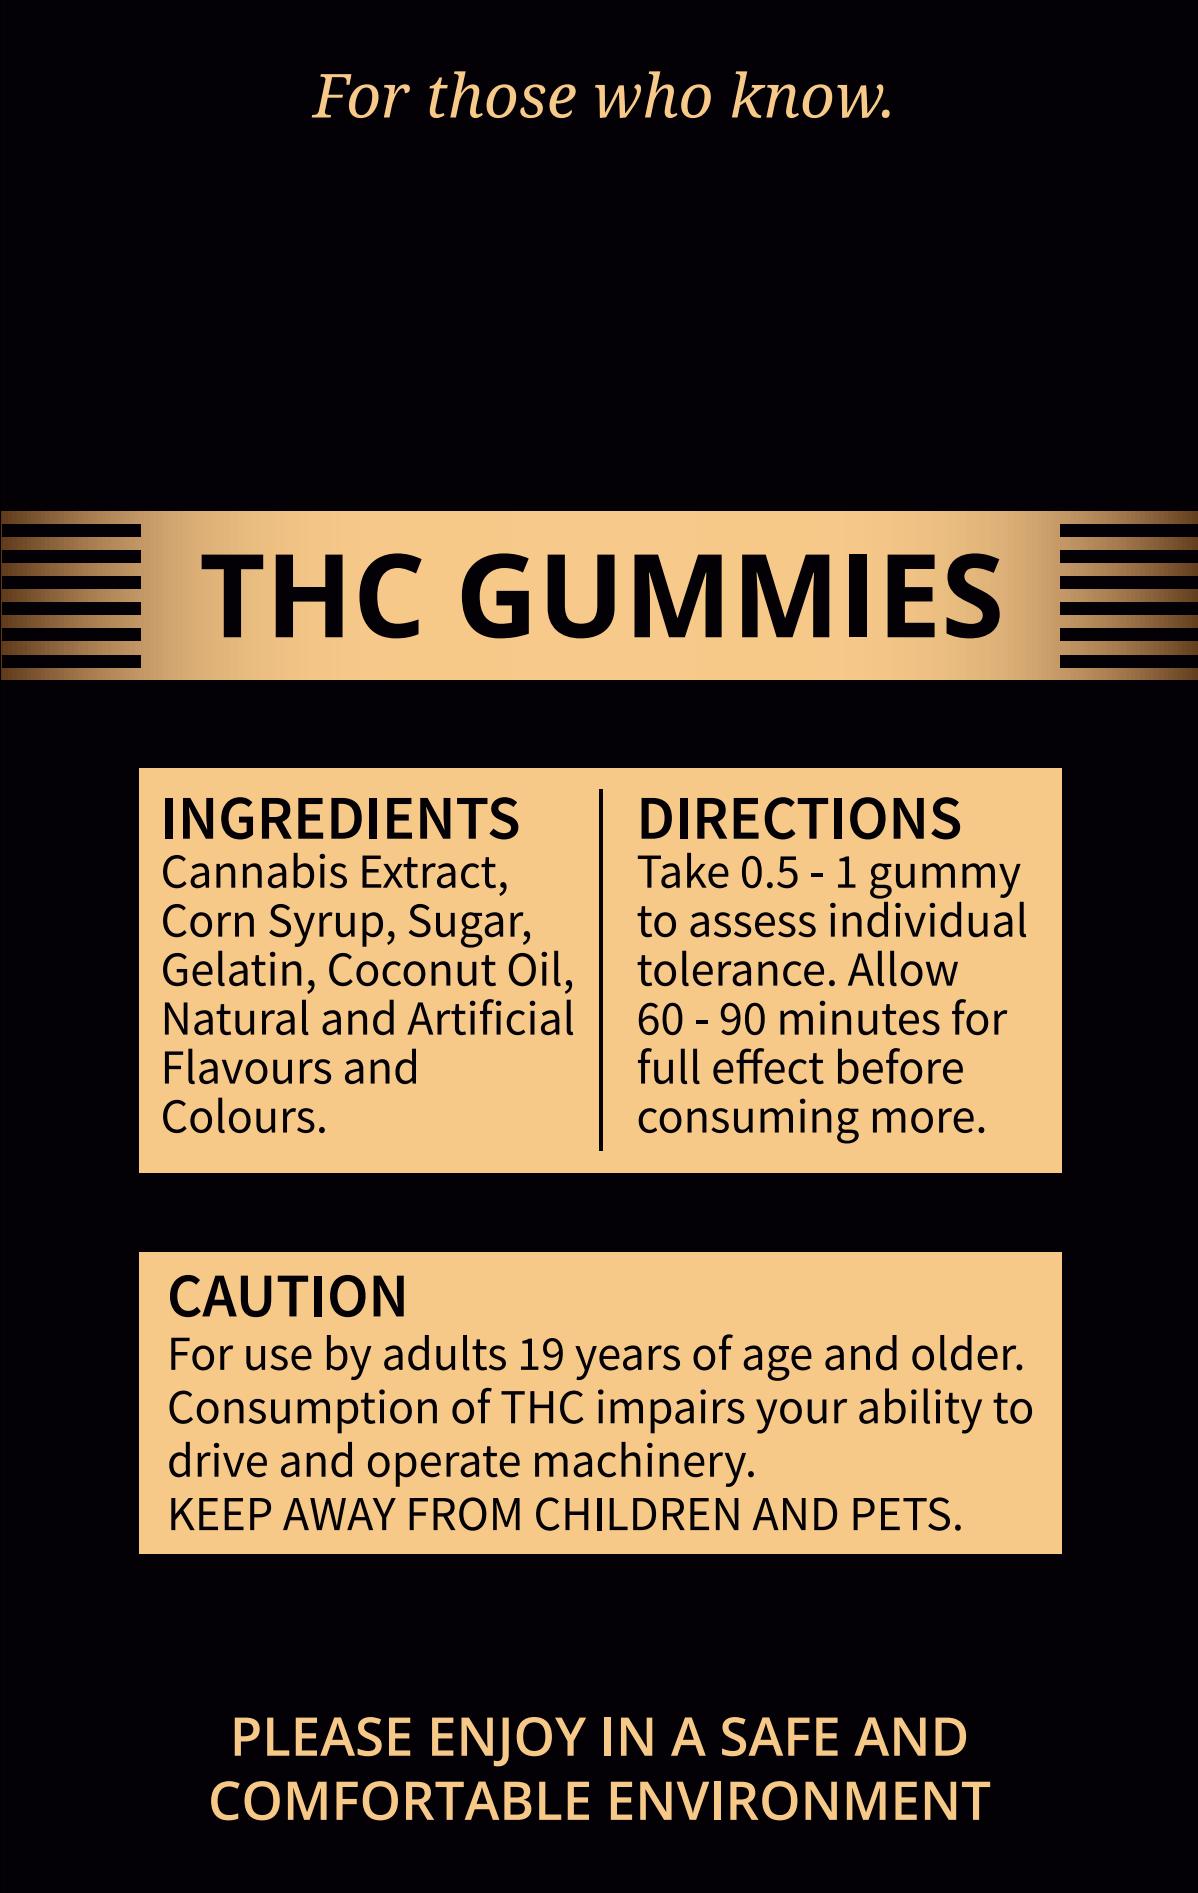 Gummy Labels/Packaging